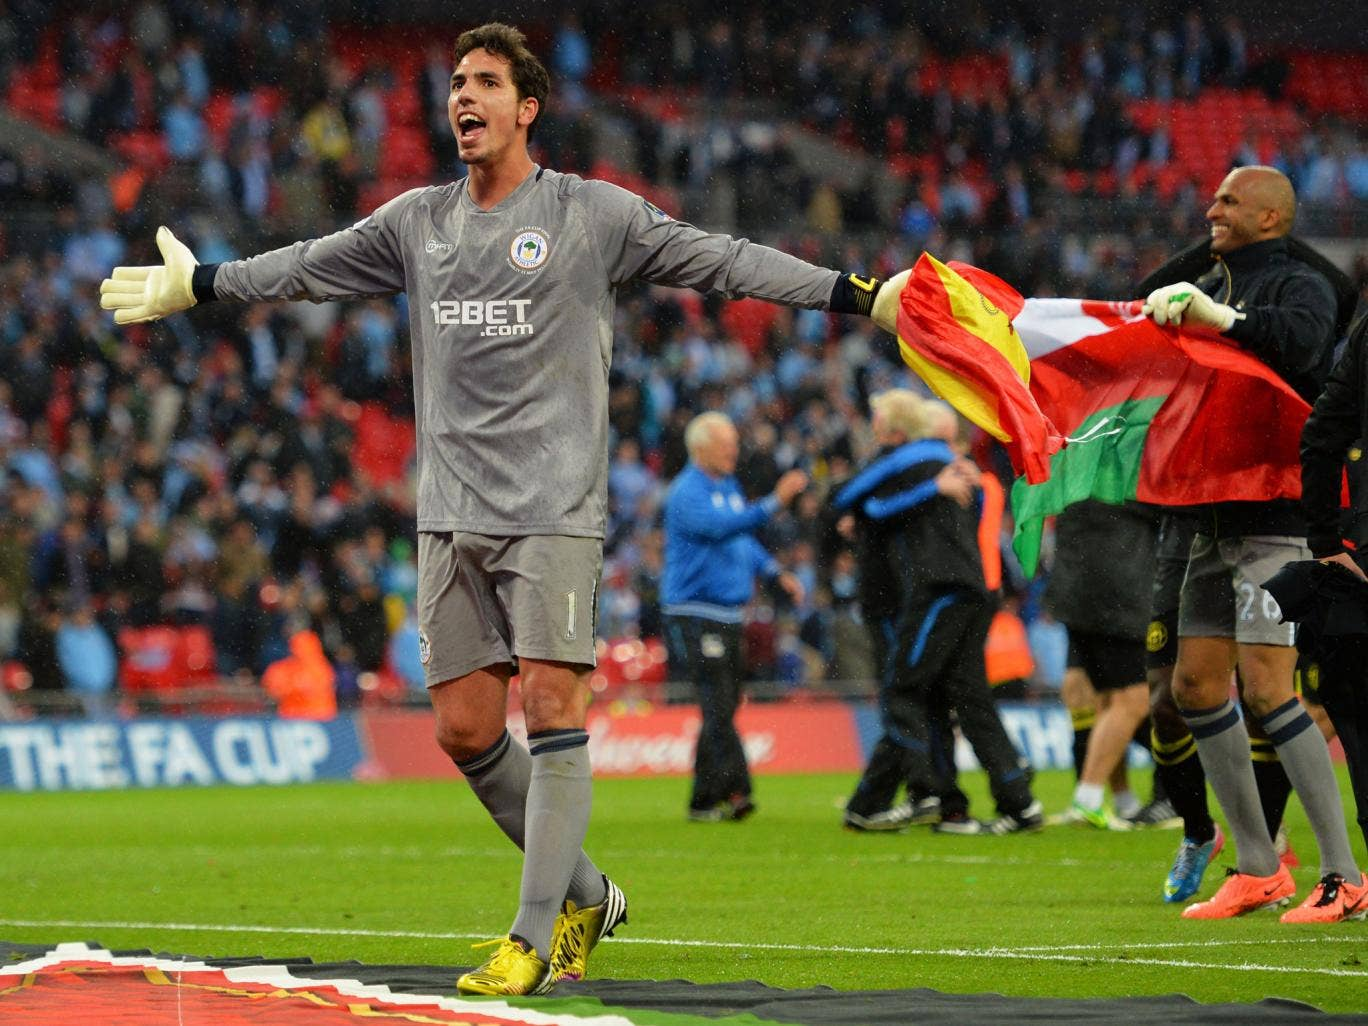 Joel Robles of Wigan Athletic celebrates victory